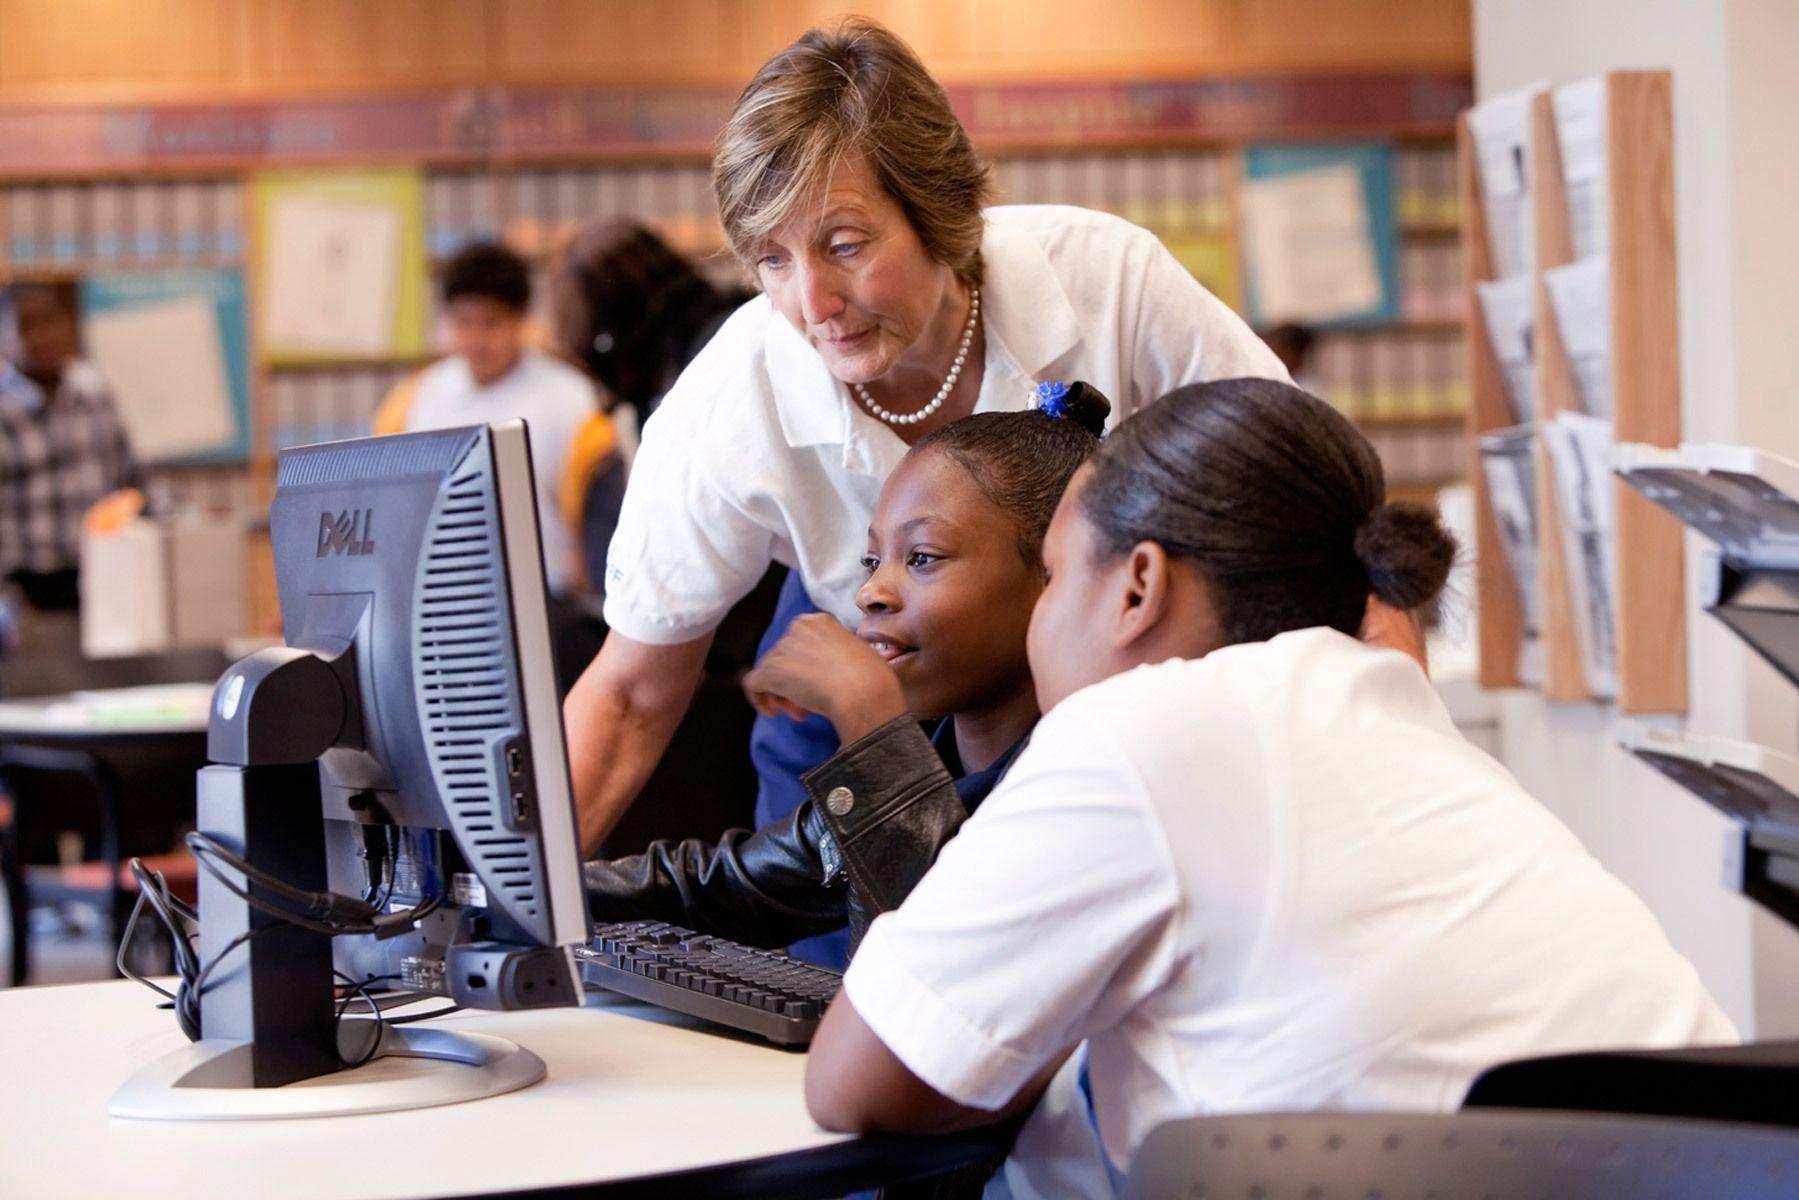 1031613_education_technology_computer_web_mg_5650